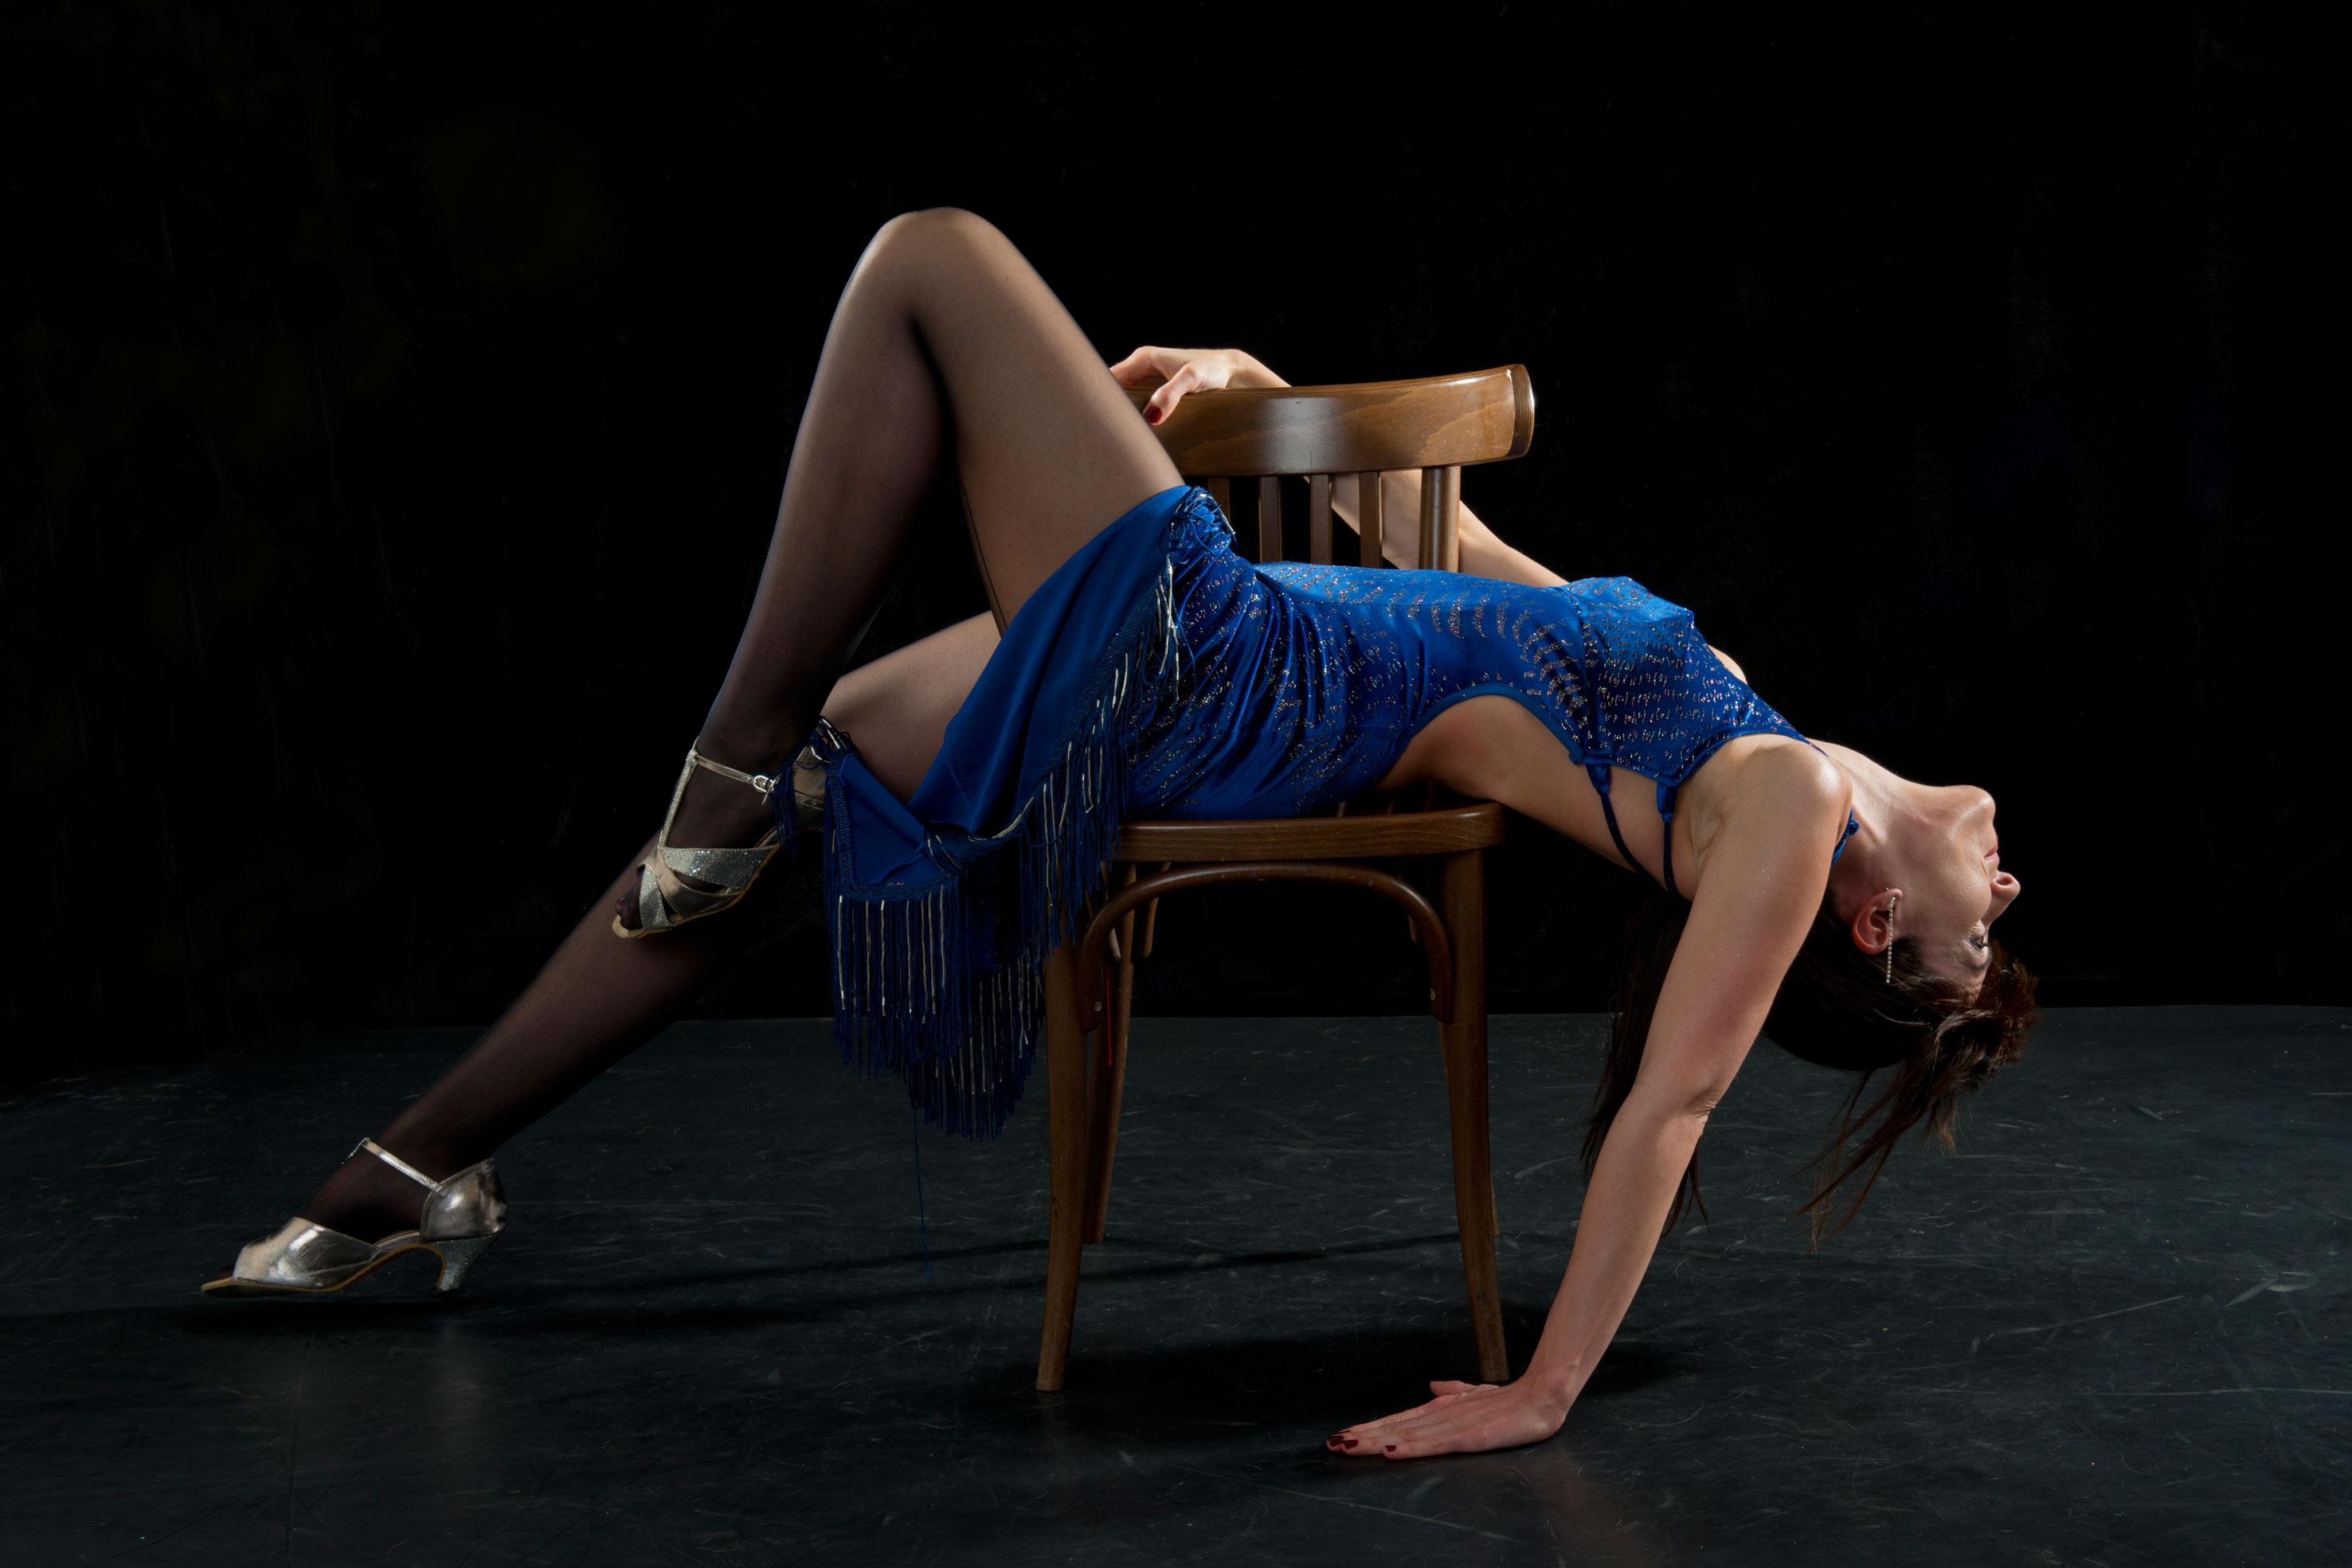 Laura Holt-Clases de baile-Profesores de baile Madrid-Baile de Boda-Baile Nupcial-Juan Brenes-juanbrenesdancer (43)